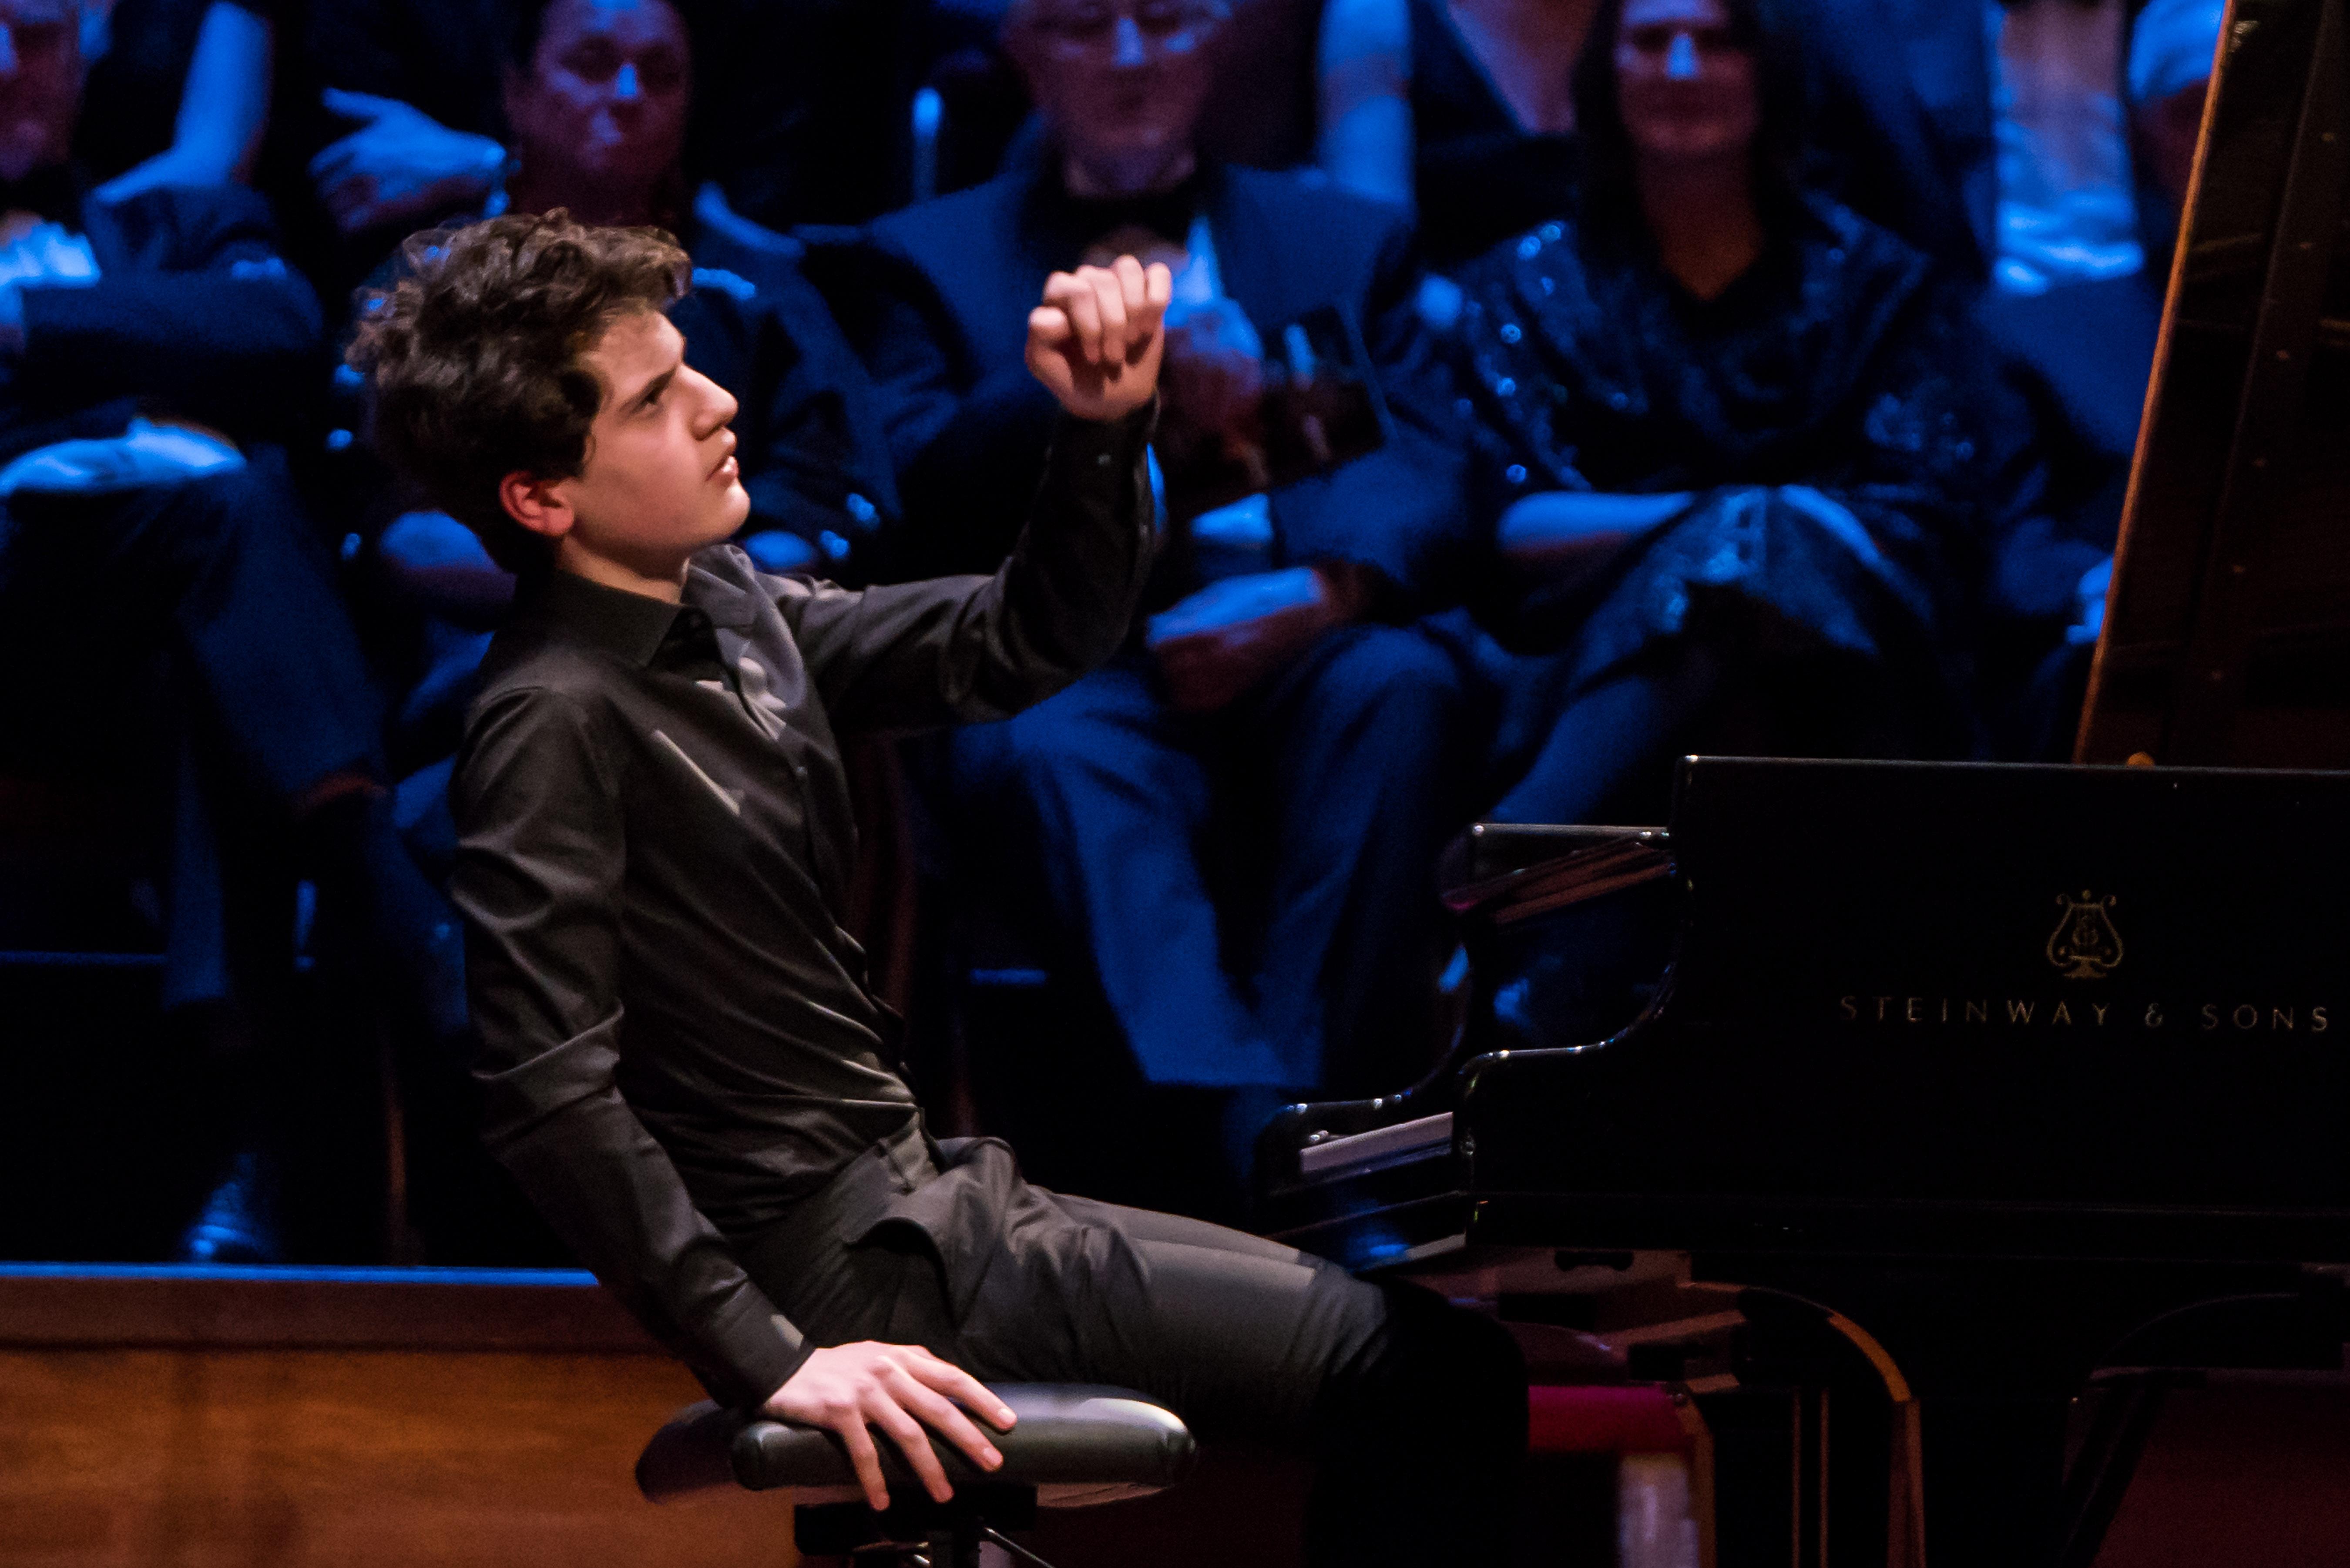 Aidan Mikdad piano_credit Ronald Knapp